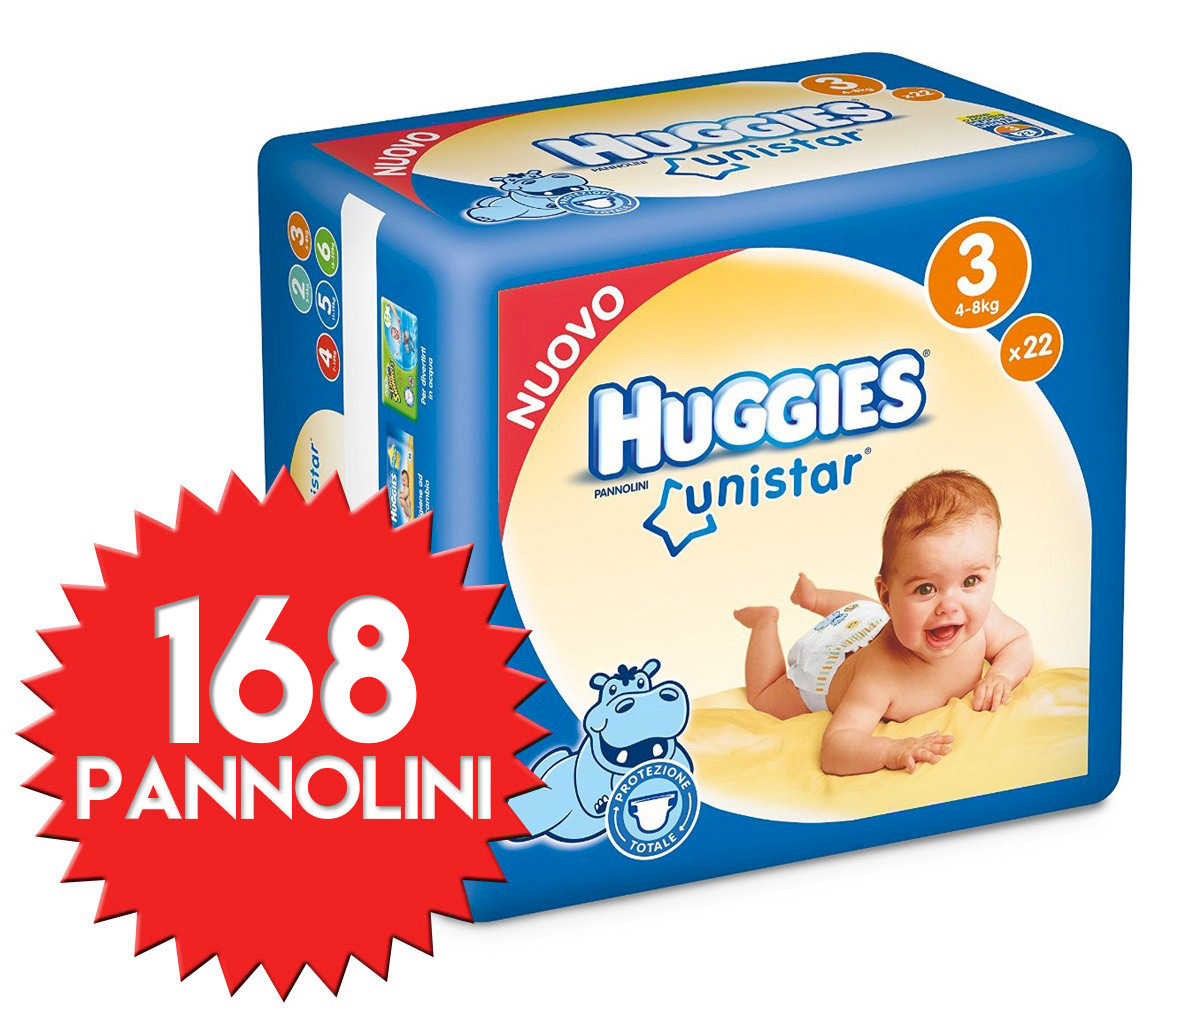 Pannolini Huggies Unistar Misura 3 - 168 pezzi